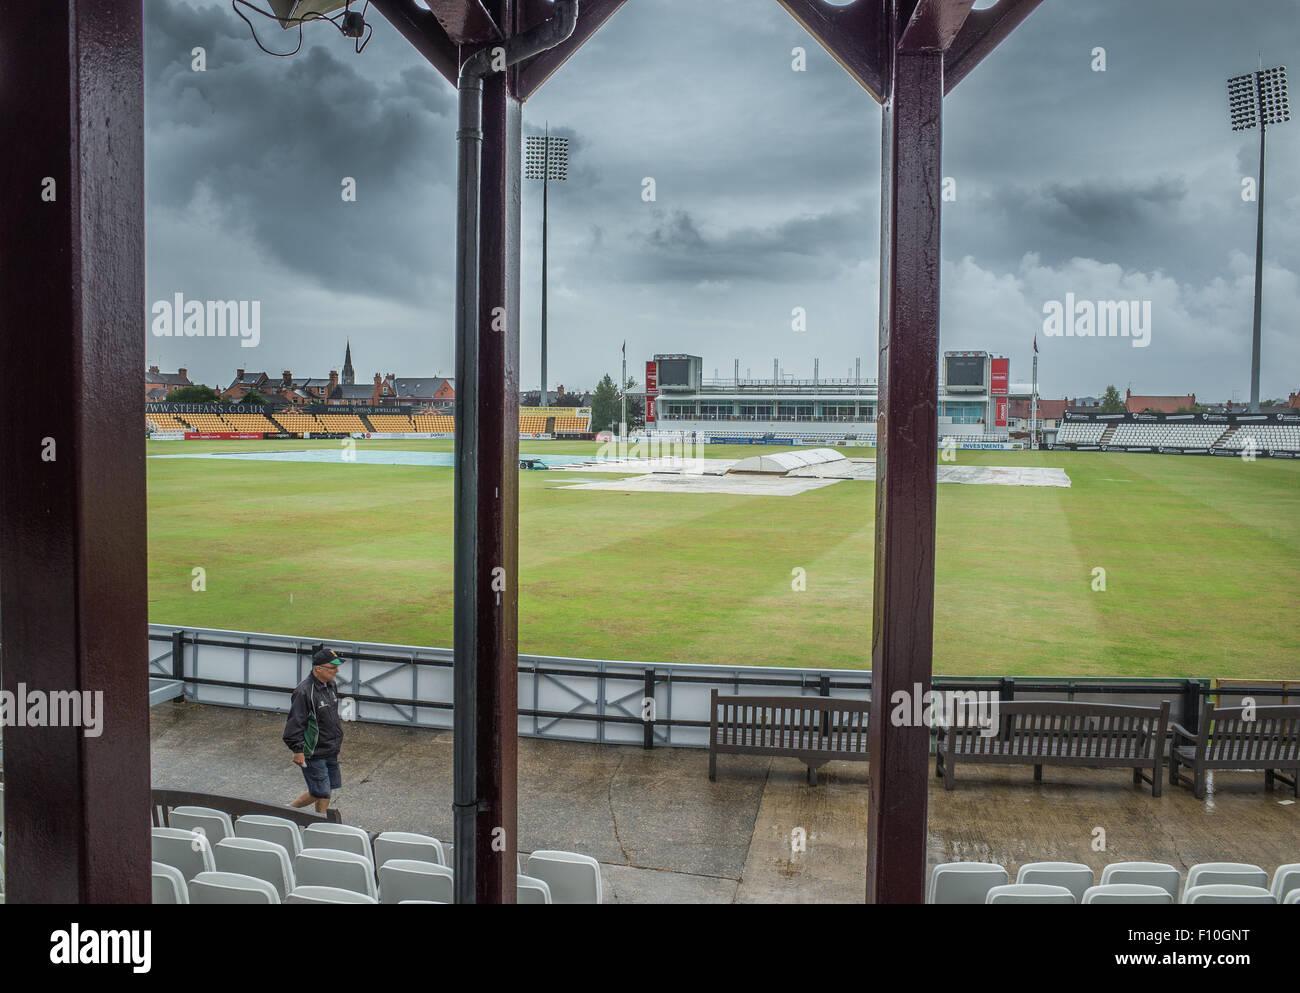 Northampton, UK. 24th Aug, 2015. Rain halts play on the final day of the cricket match between Northamptonshire - Stock Image